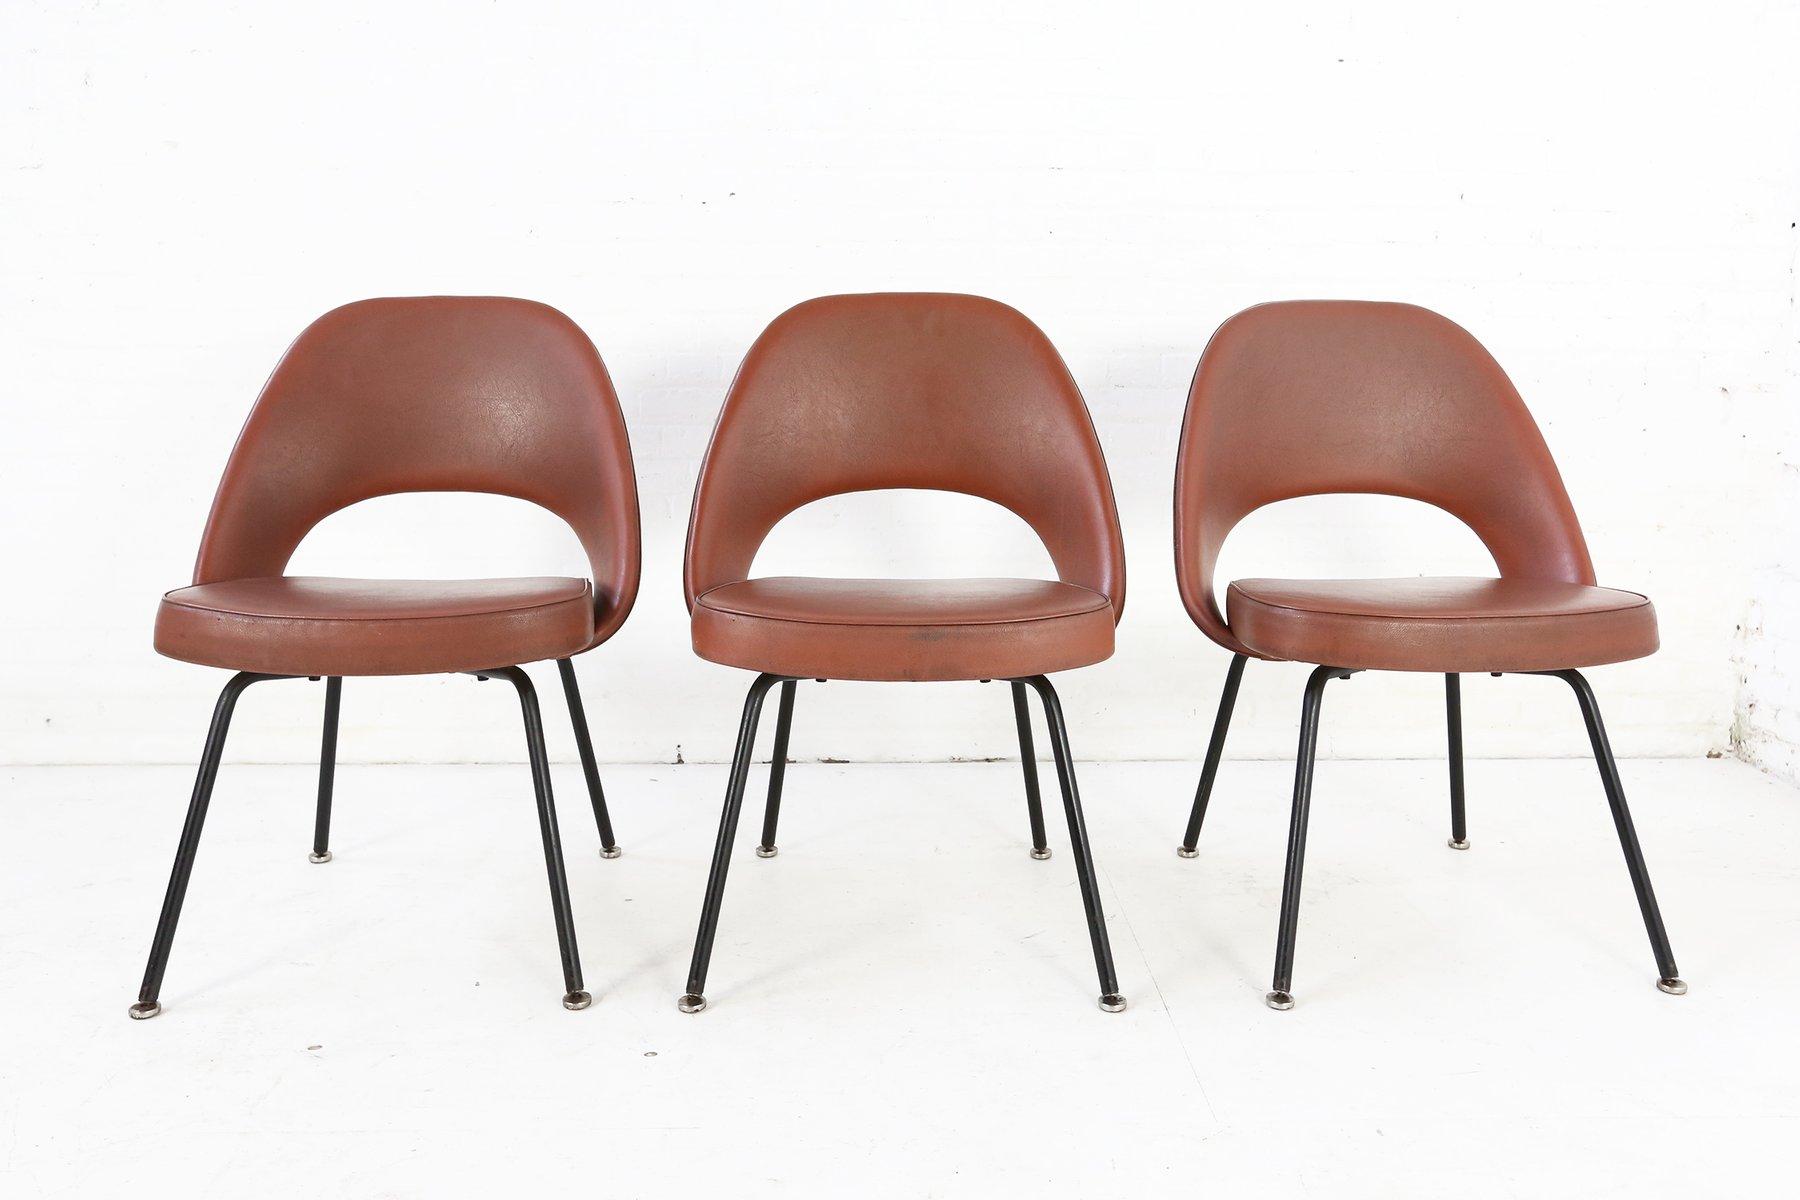 Chaise sans bras s rie 71 par eero saarinen pour knoll international 1960s en vente sur pamono - Tavolo saarinen knoll originale ...